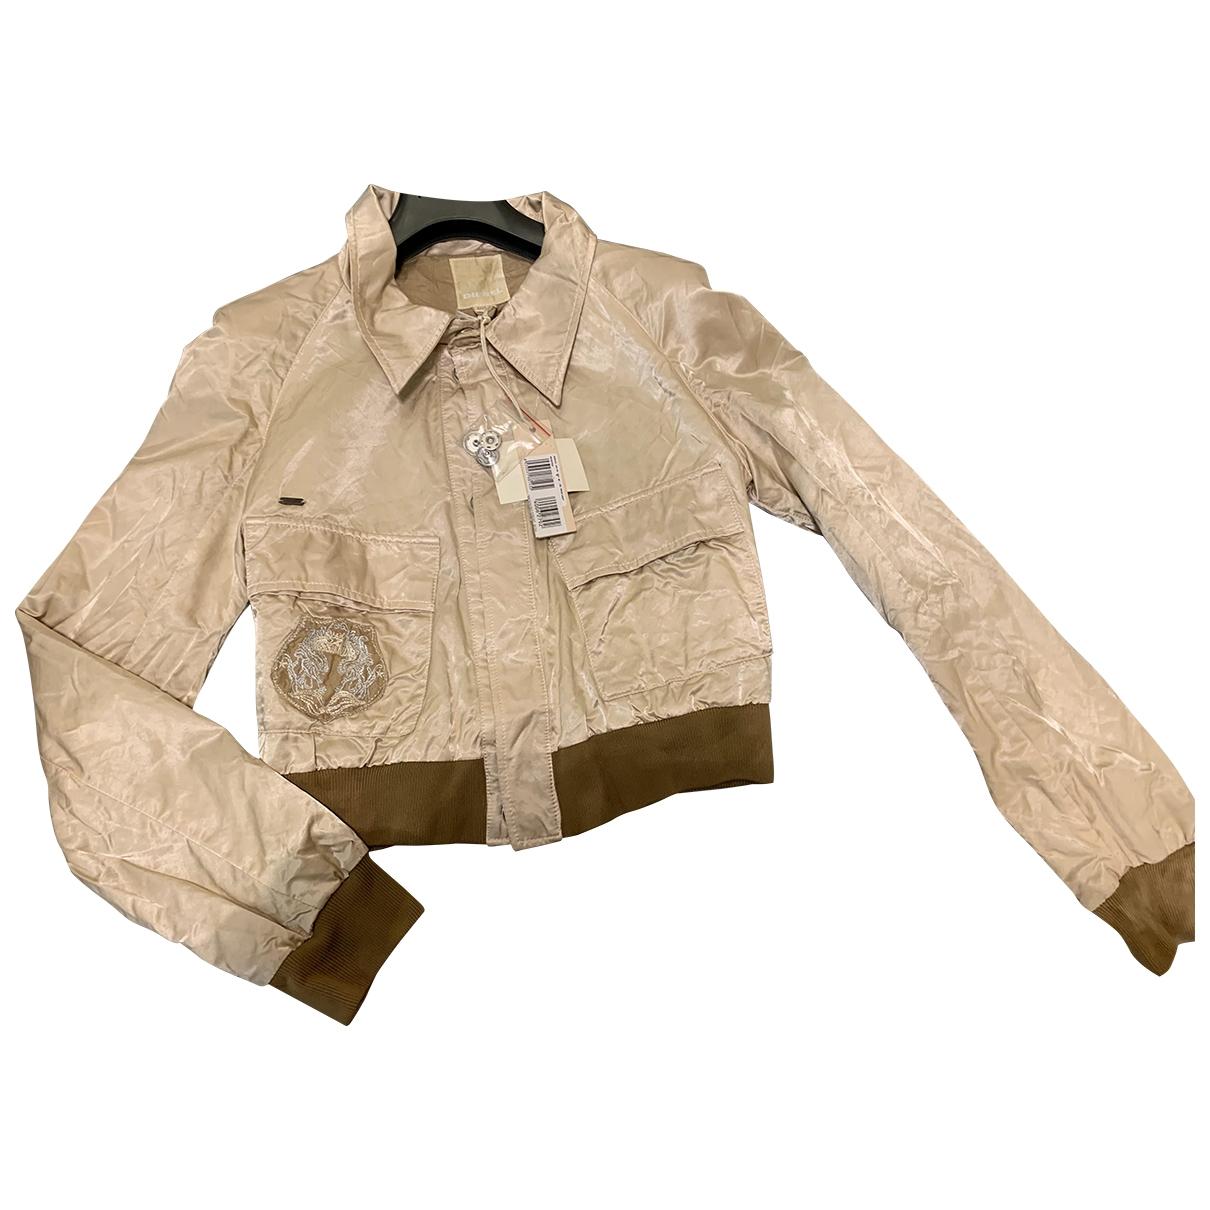 Diesel \N Beige Cotton jacket for Women M International